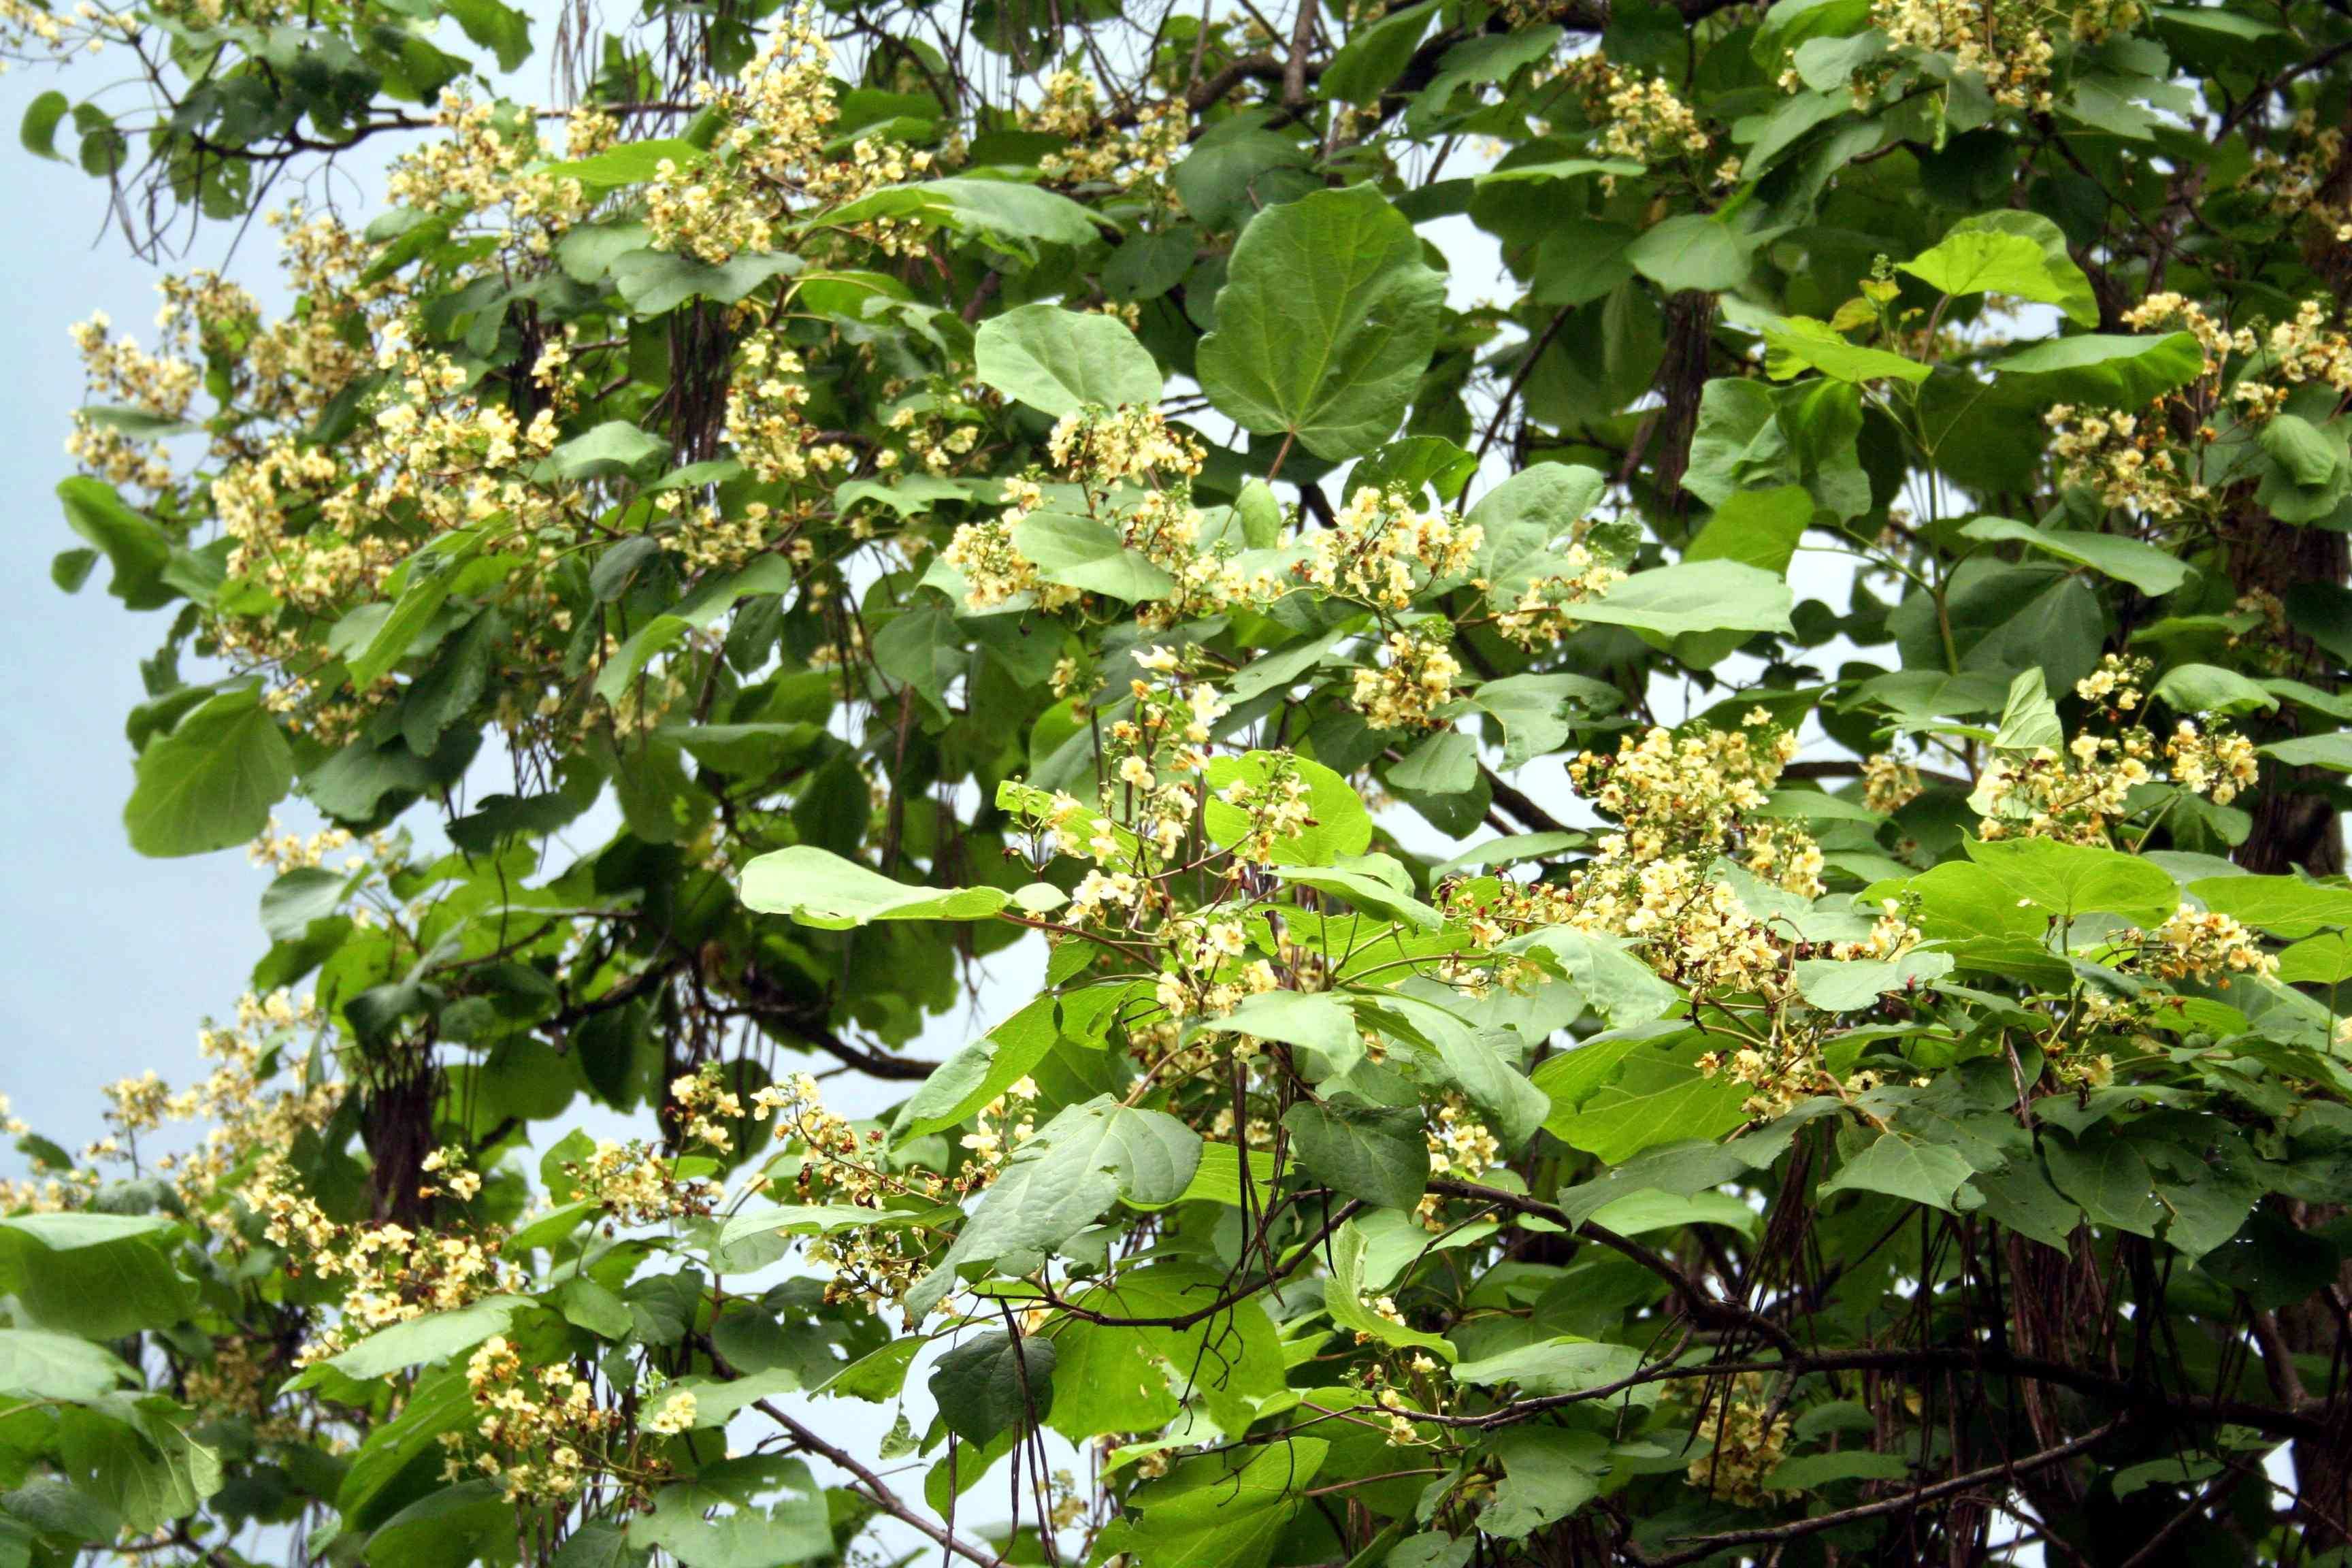 The Catalpa Tree And Its Caterpillars